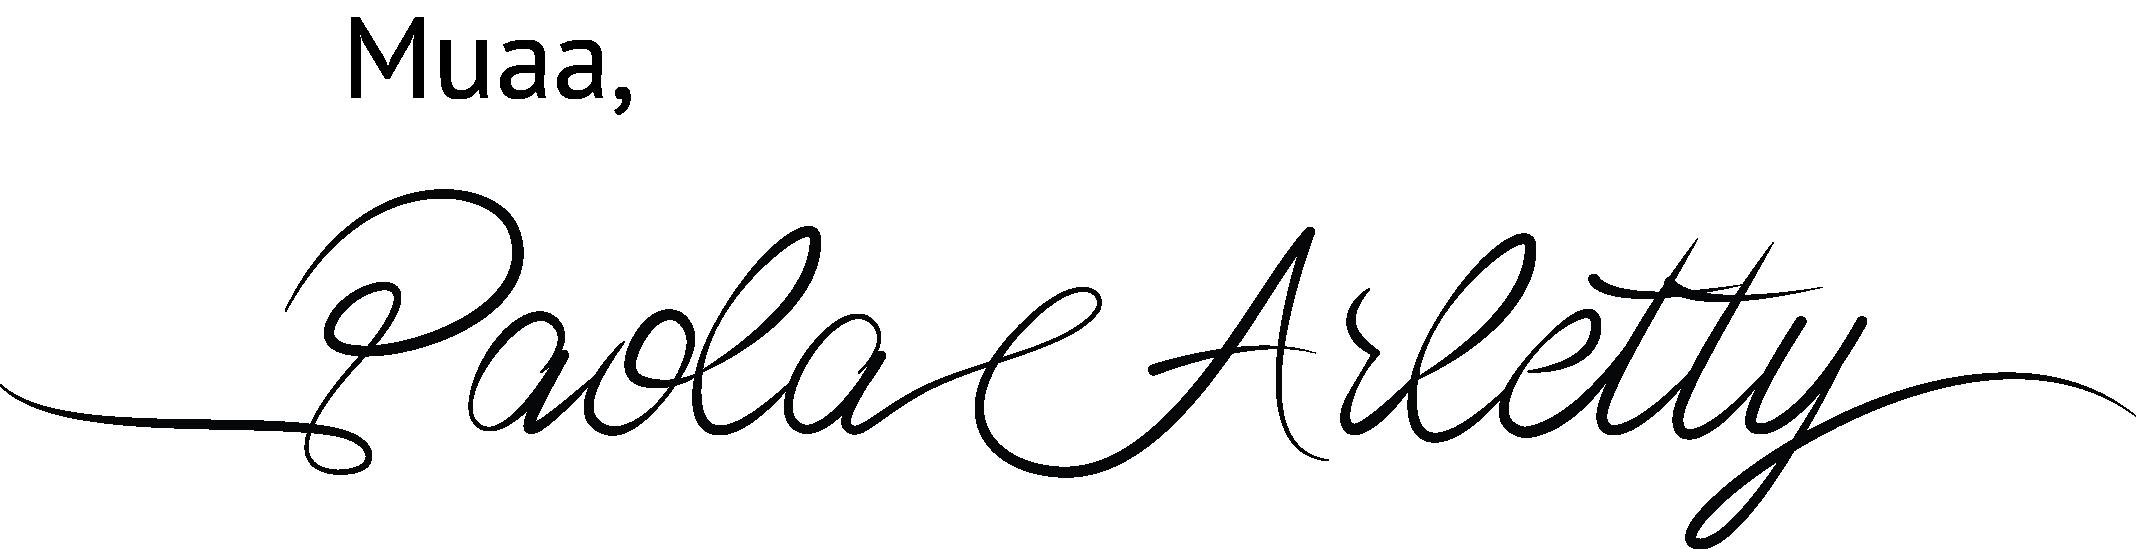 Asset 48.png